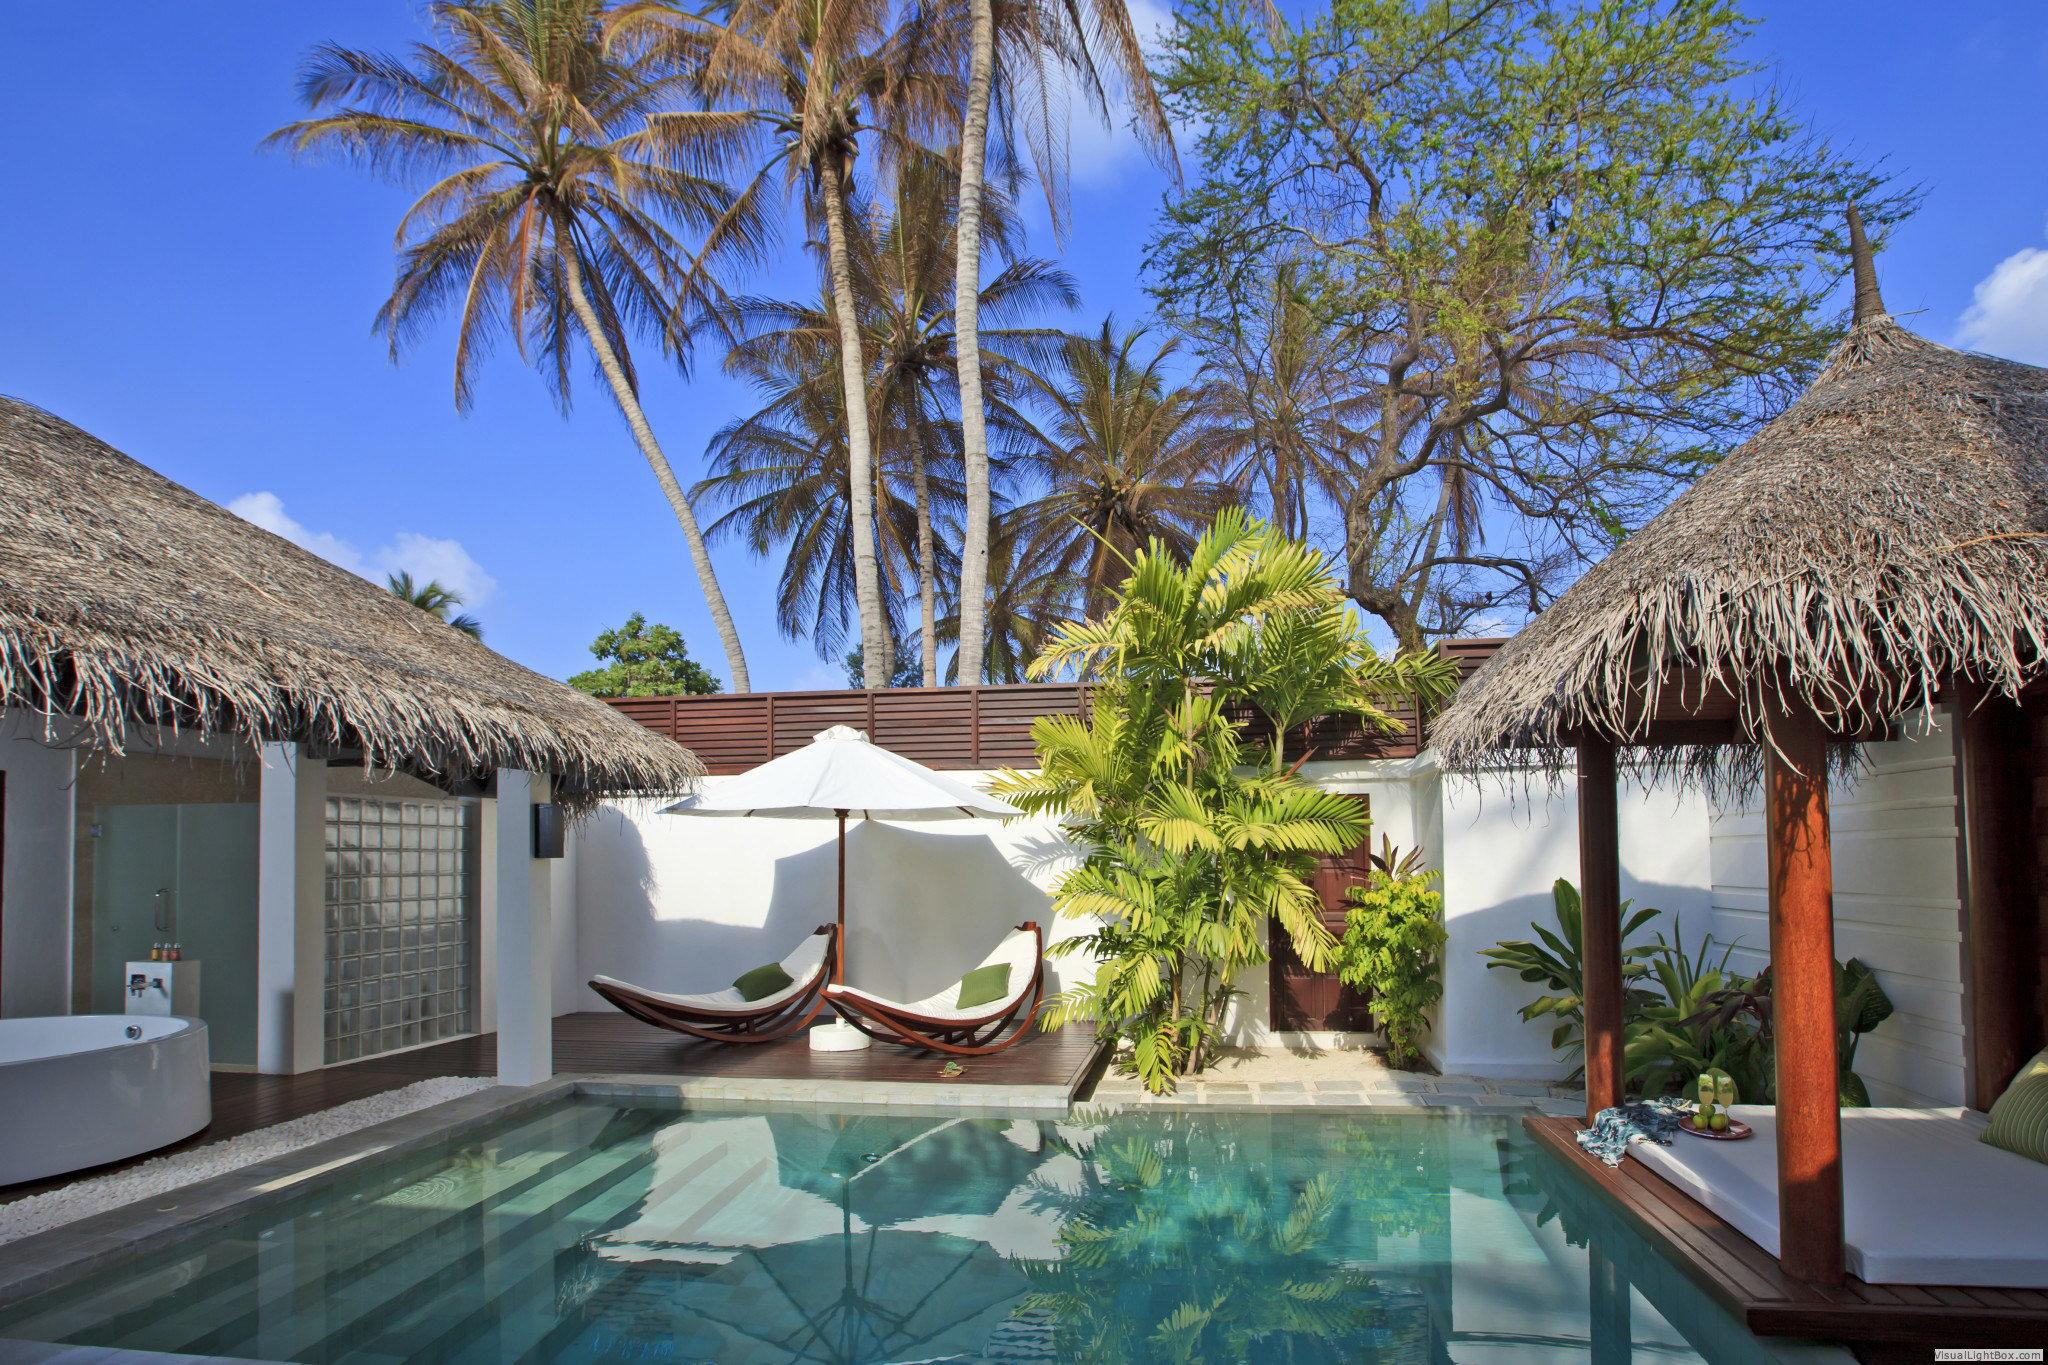 tree property Resort building swimming pool Villa caribbean home palm mansion cottage eco hotel condominium roof Garden